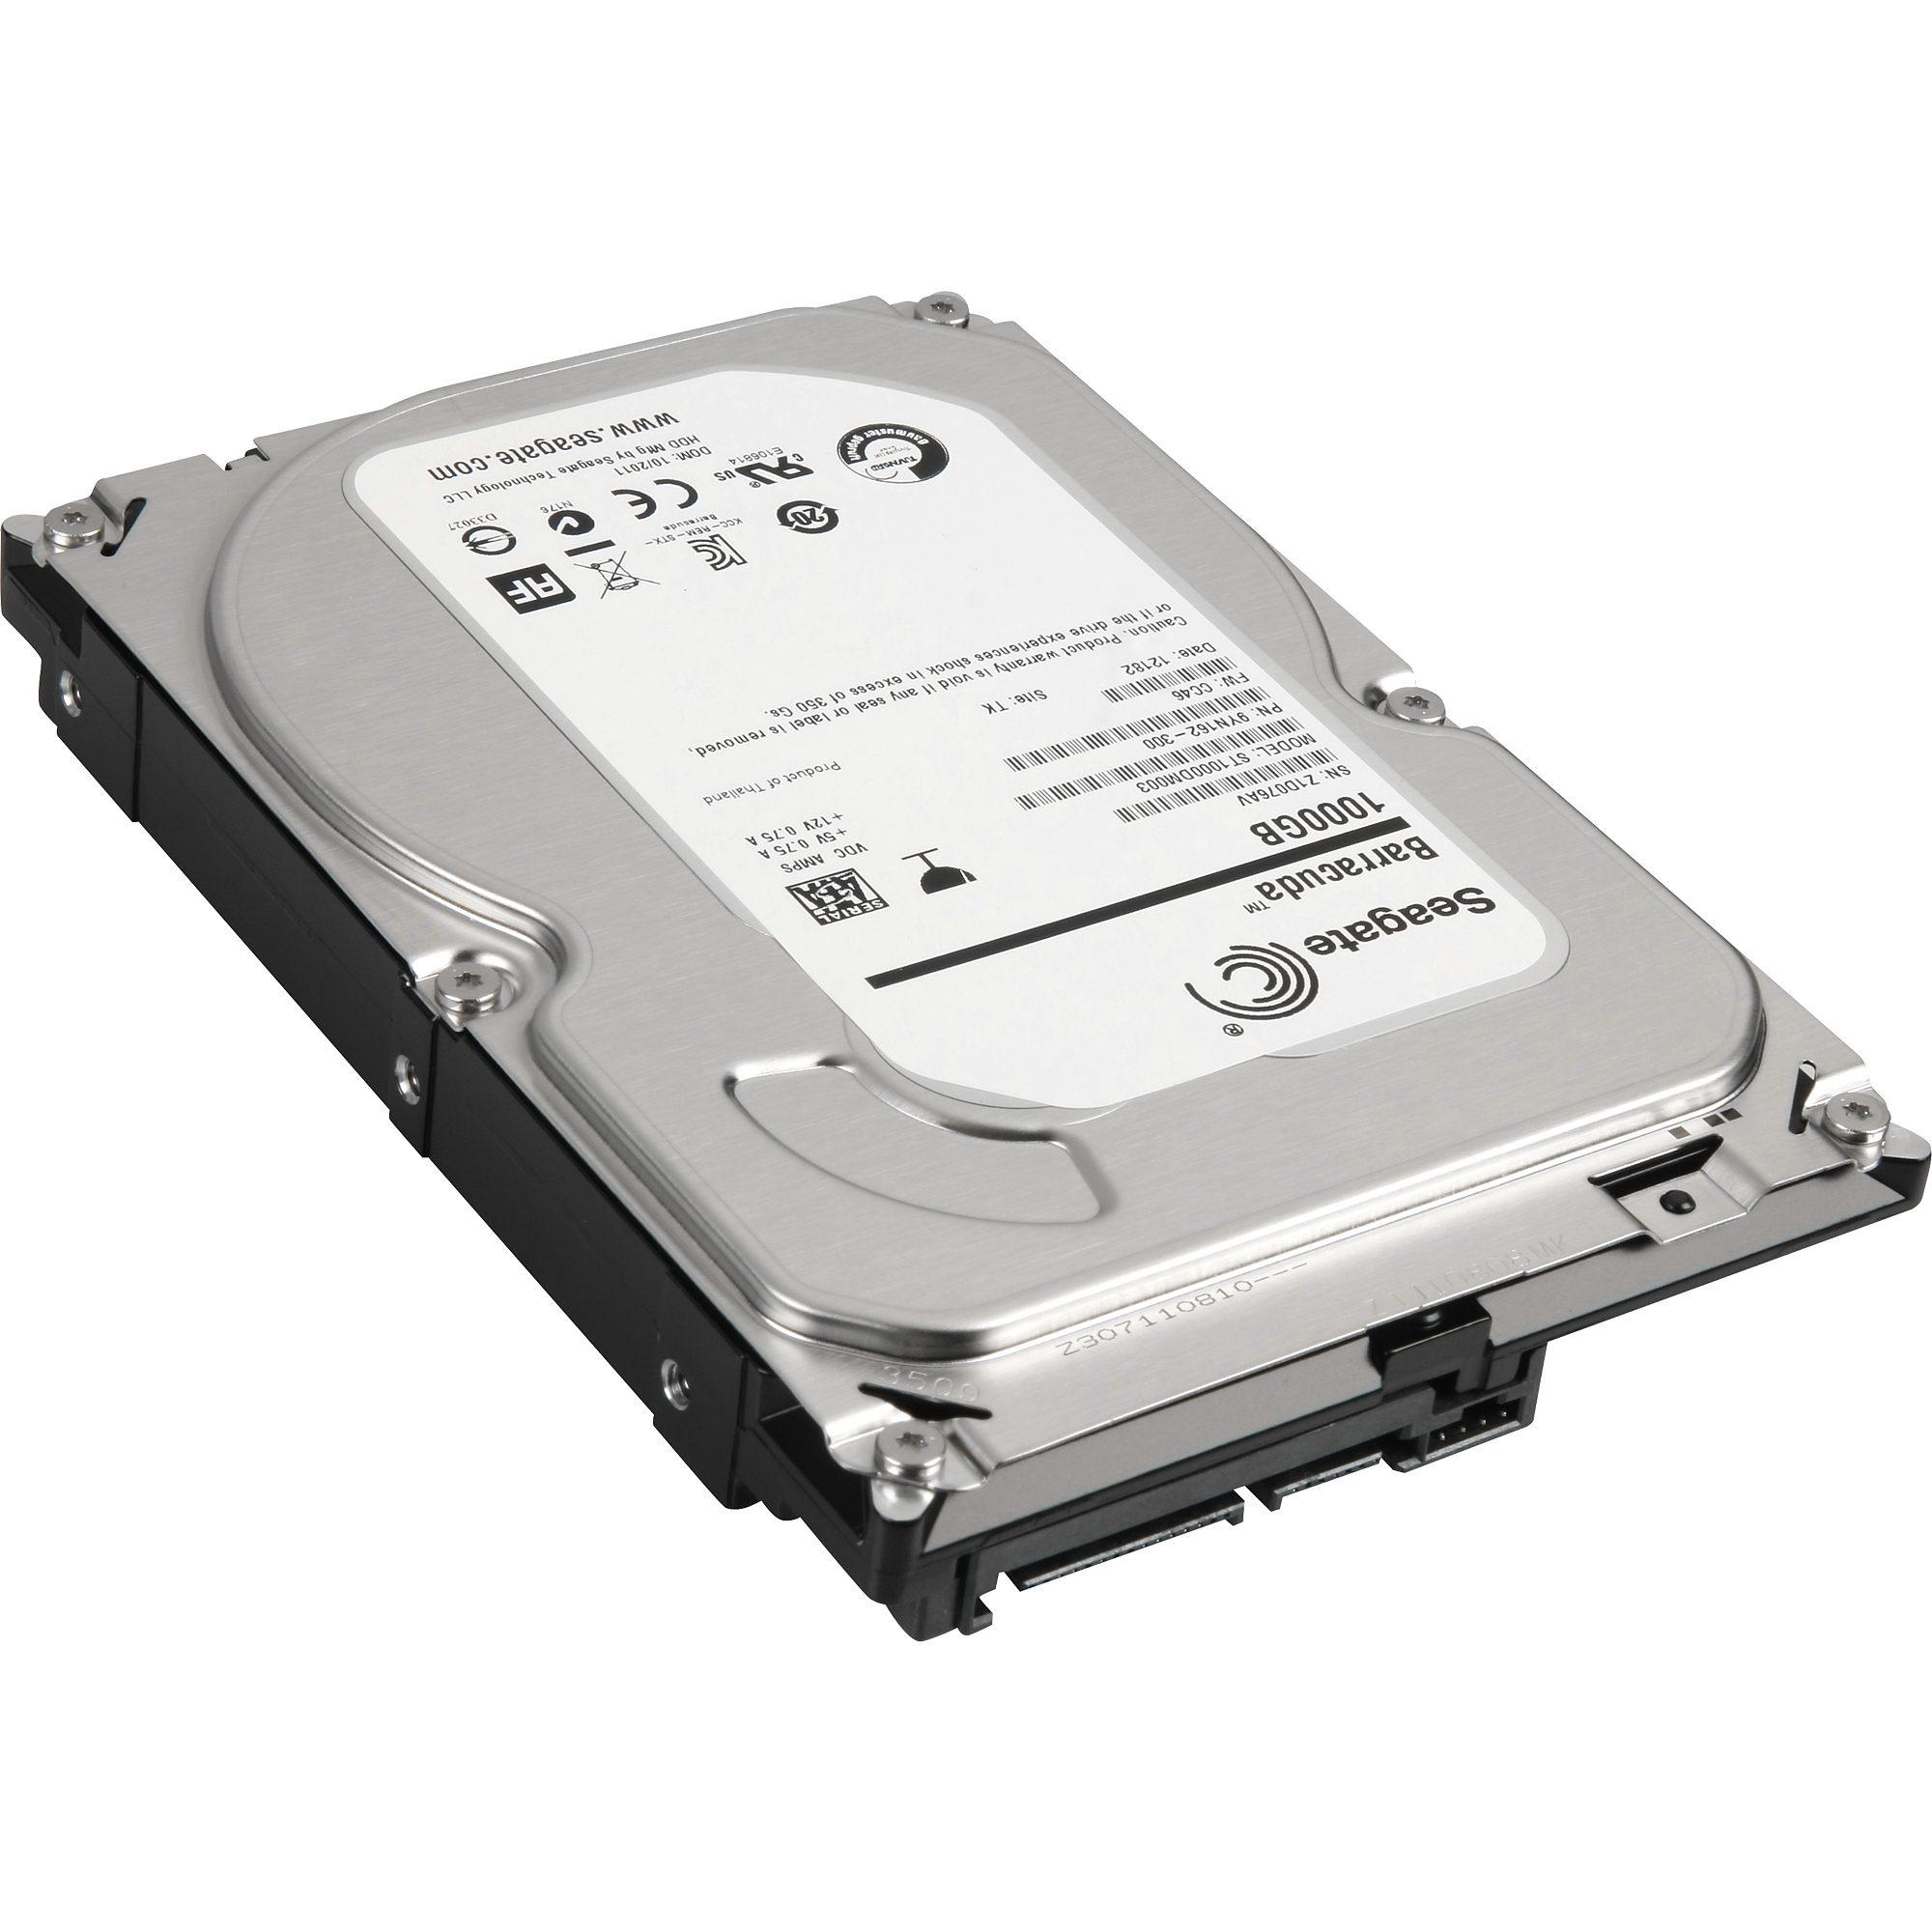 Seagate Festplatte »ST1000DM003 1 TB«